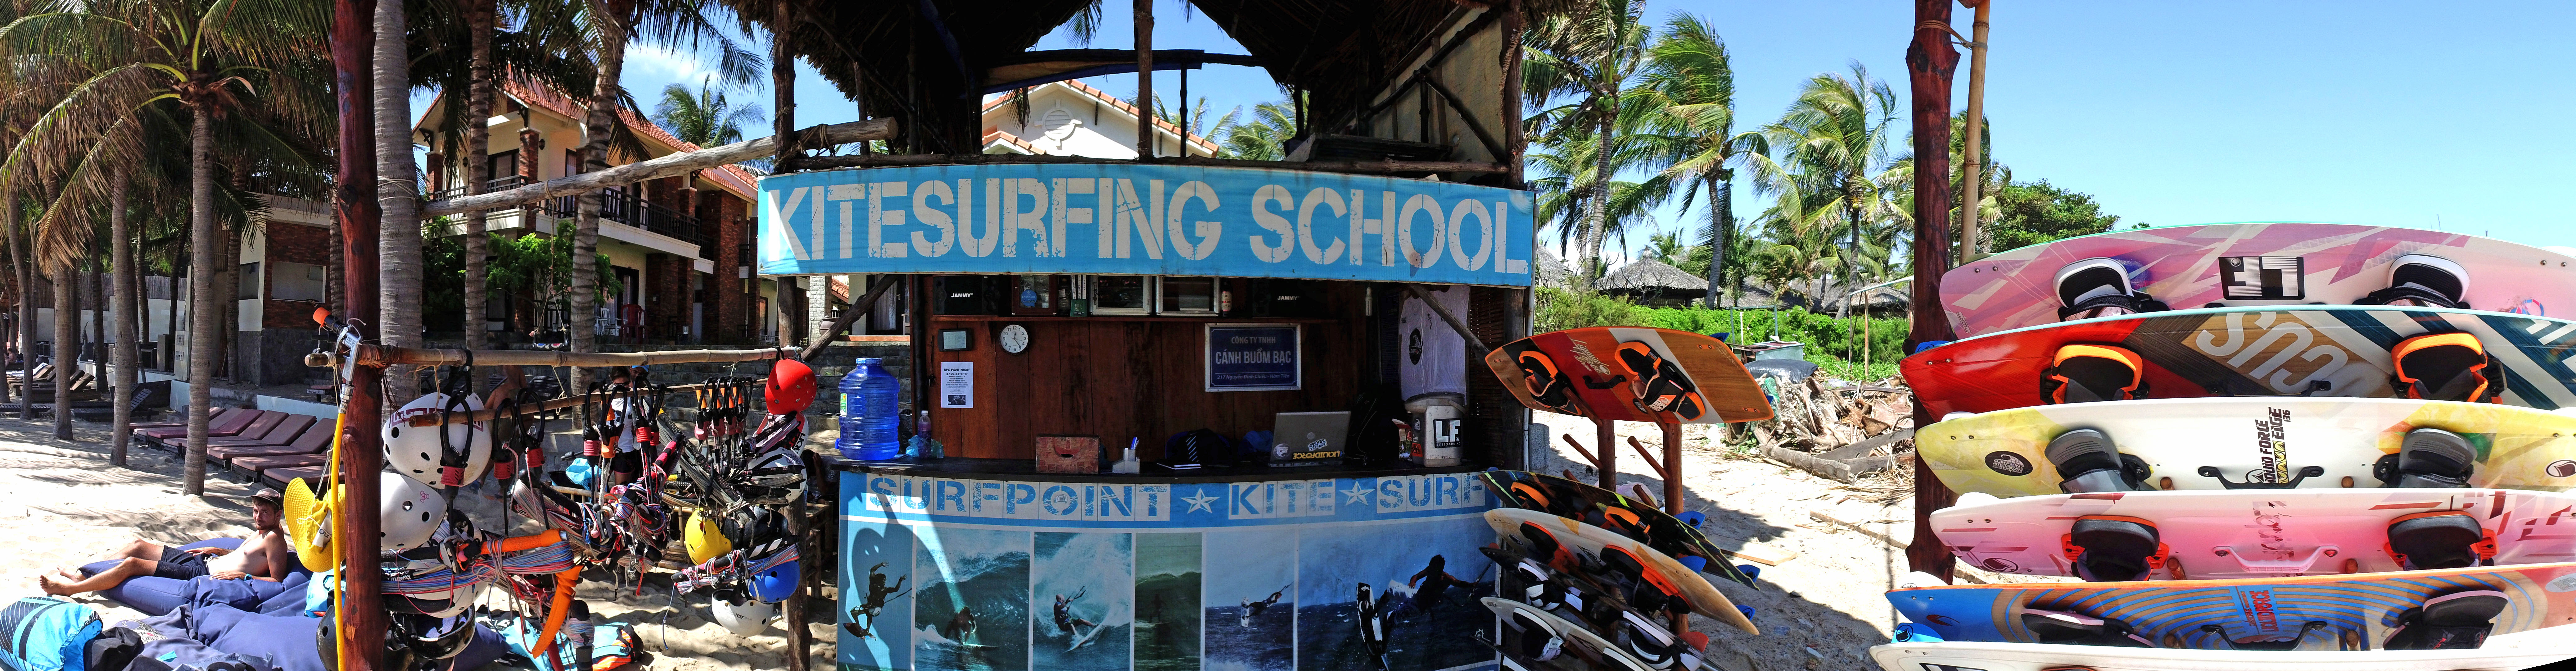 Kiteboarding Equipment Rental